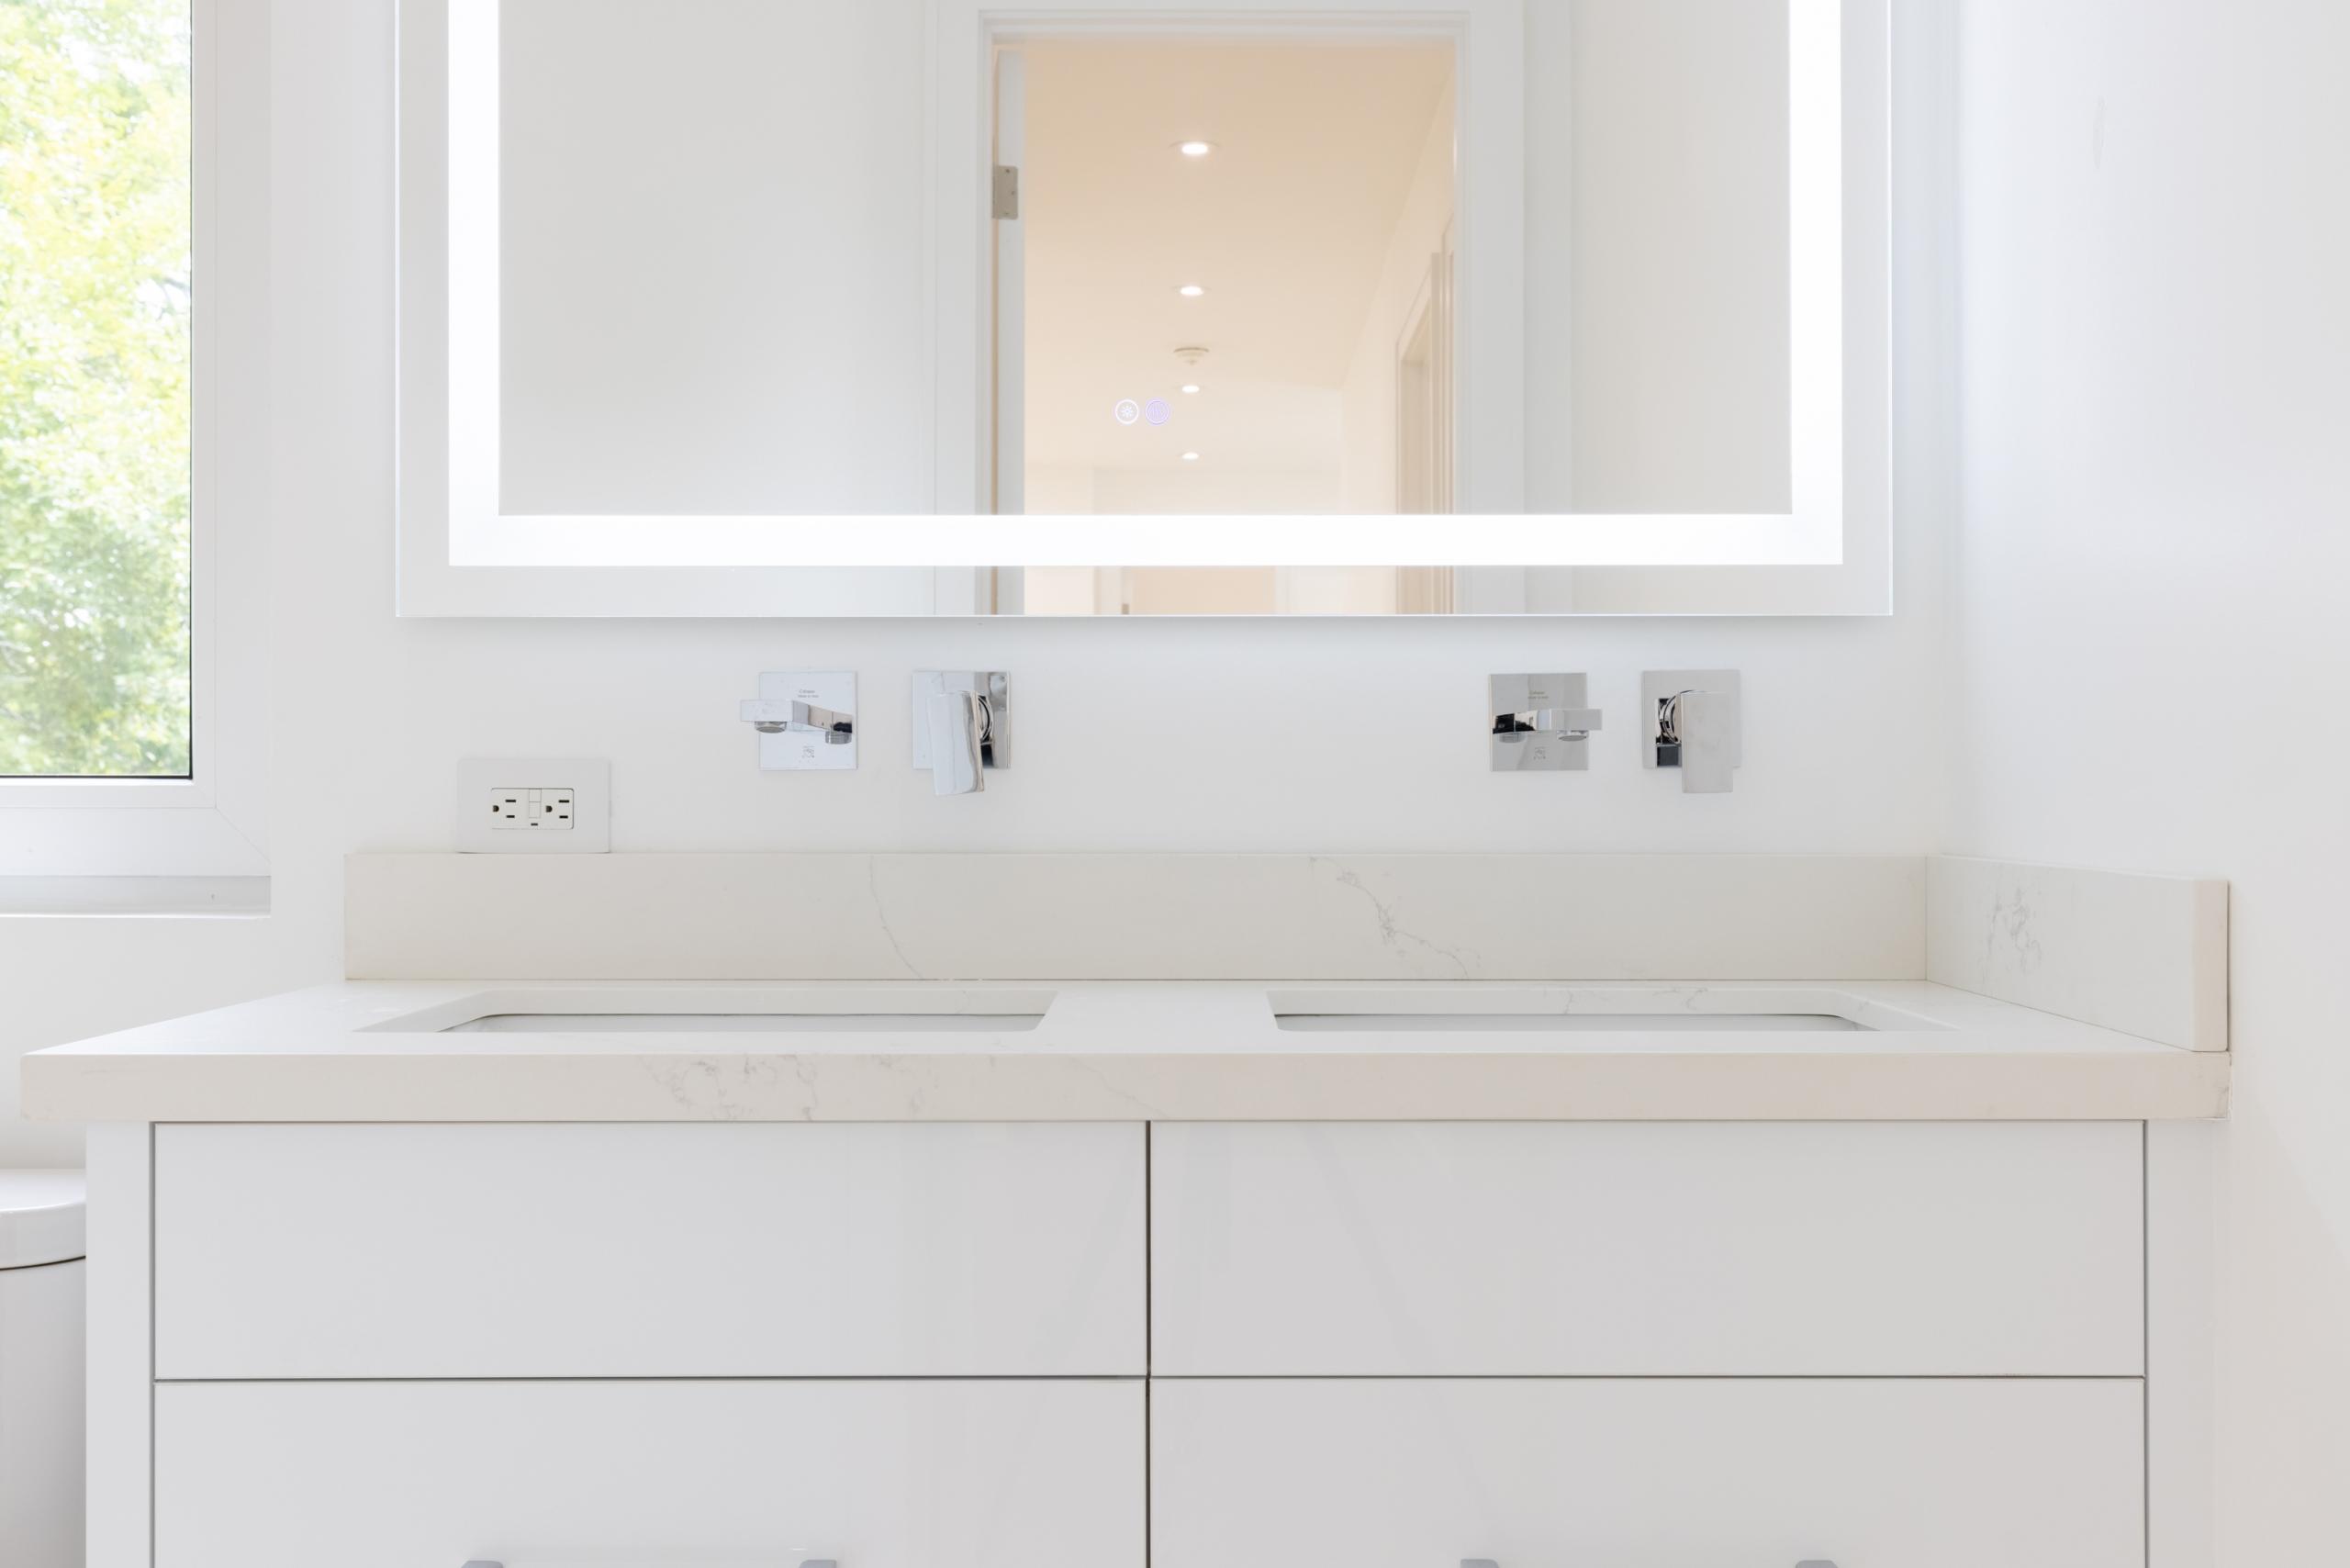 Bathroom featured at 287 Sabel Street, Oakville, ON at Alex Irish & Associates